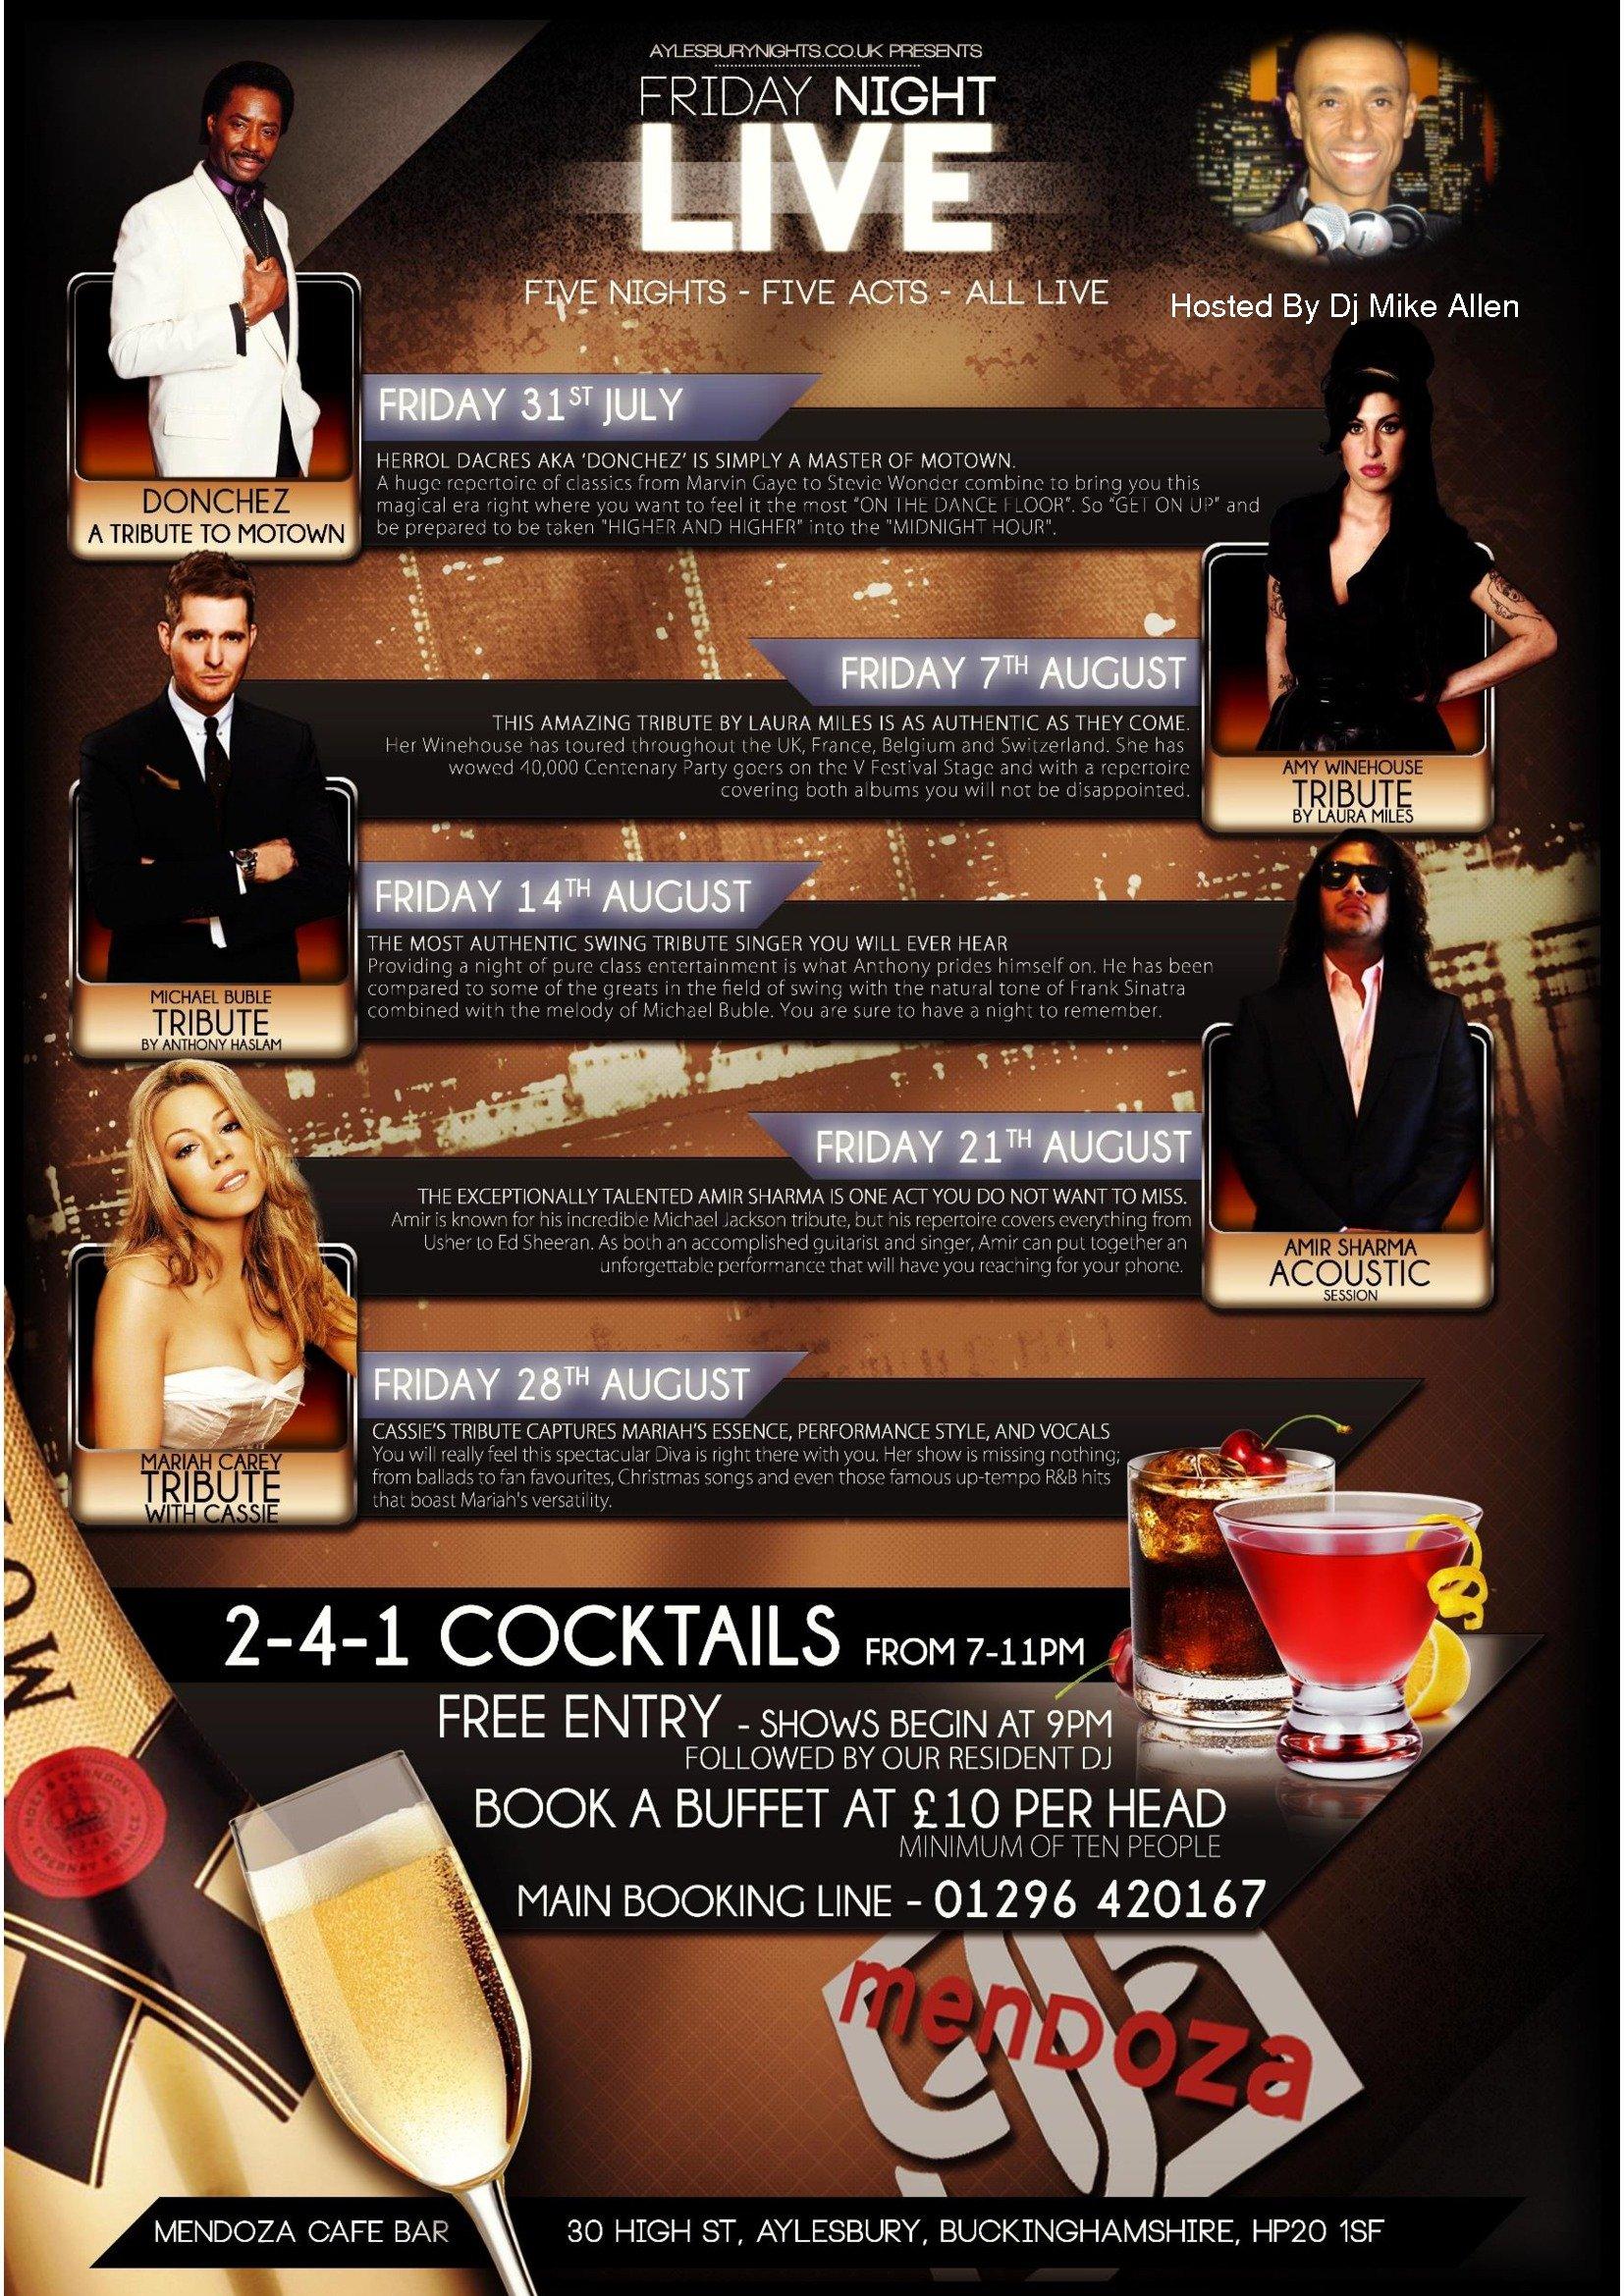 2-4-1 cocktails